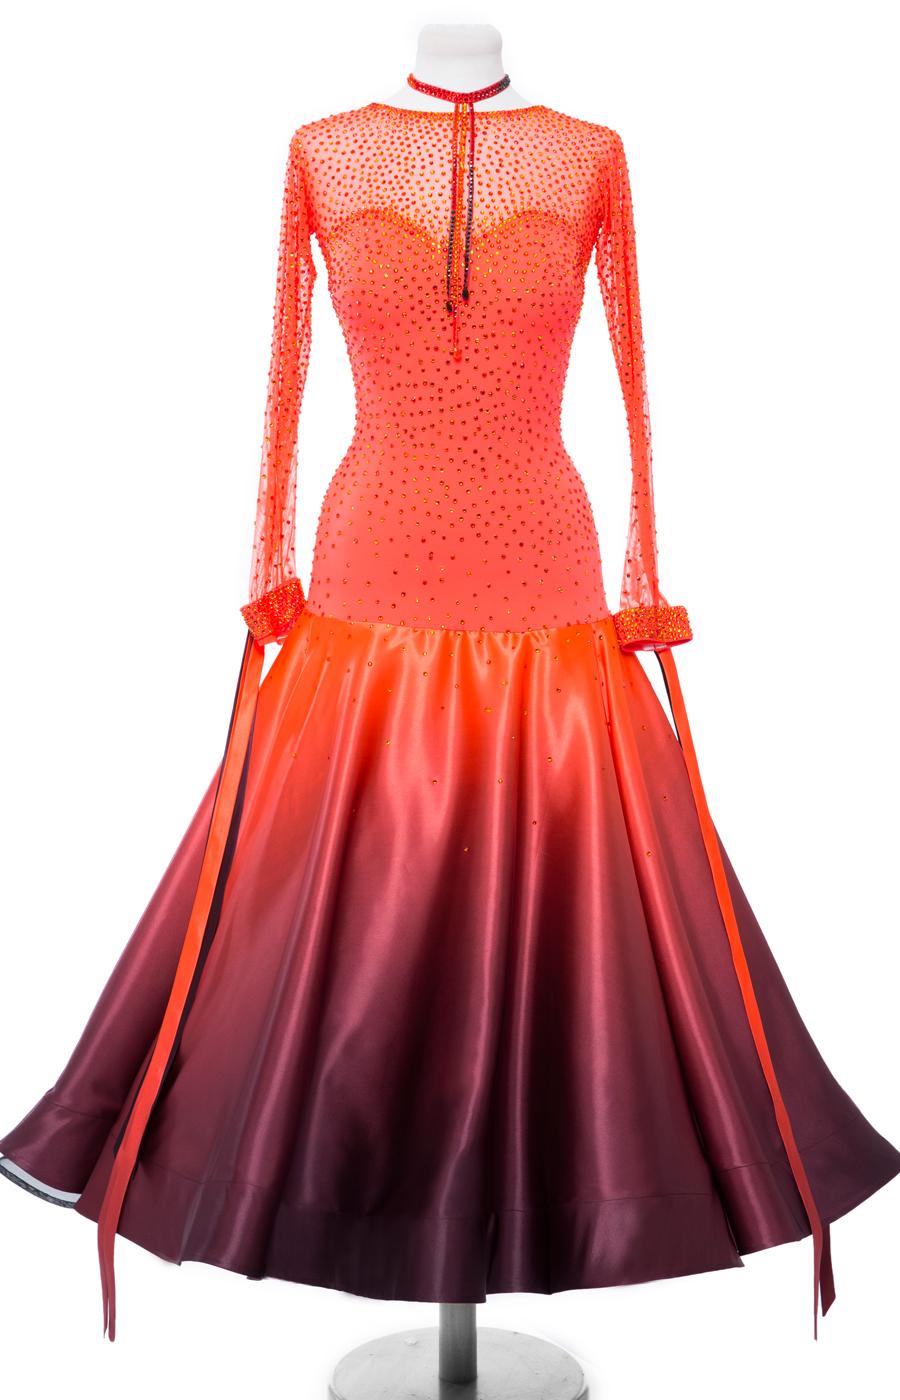 Ballroom dress Tango Flare